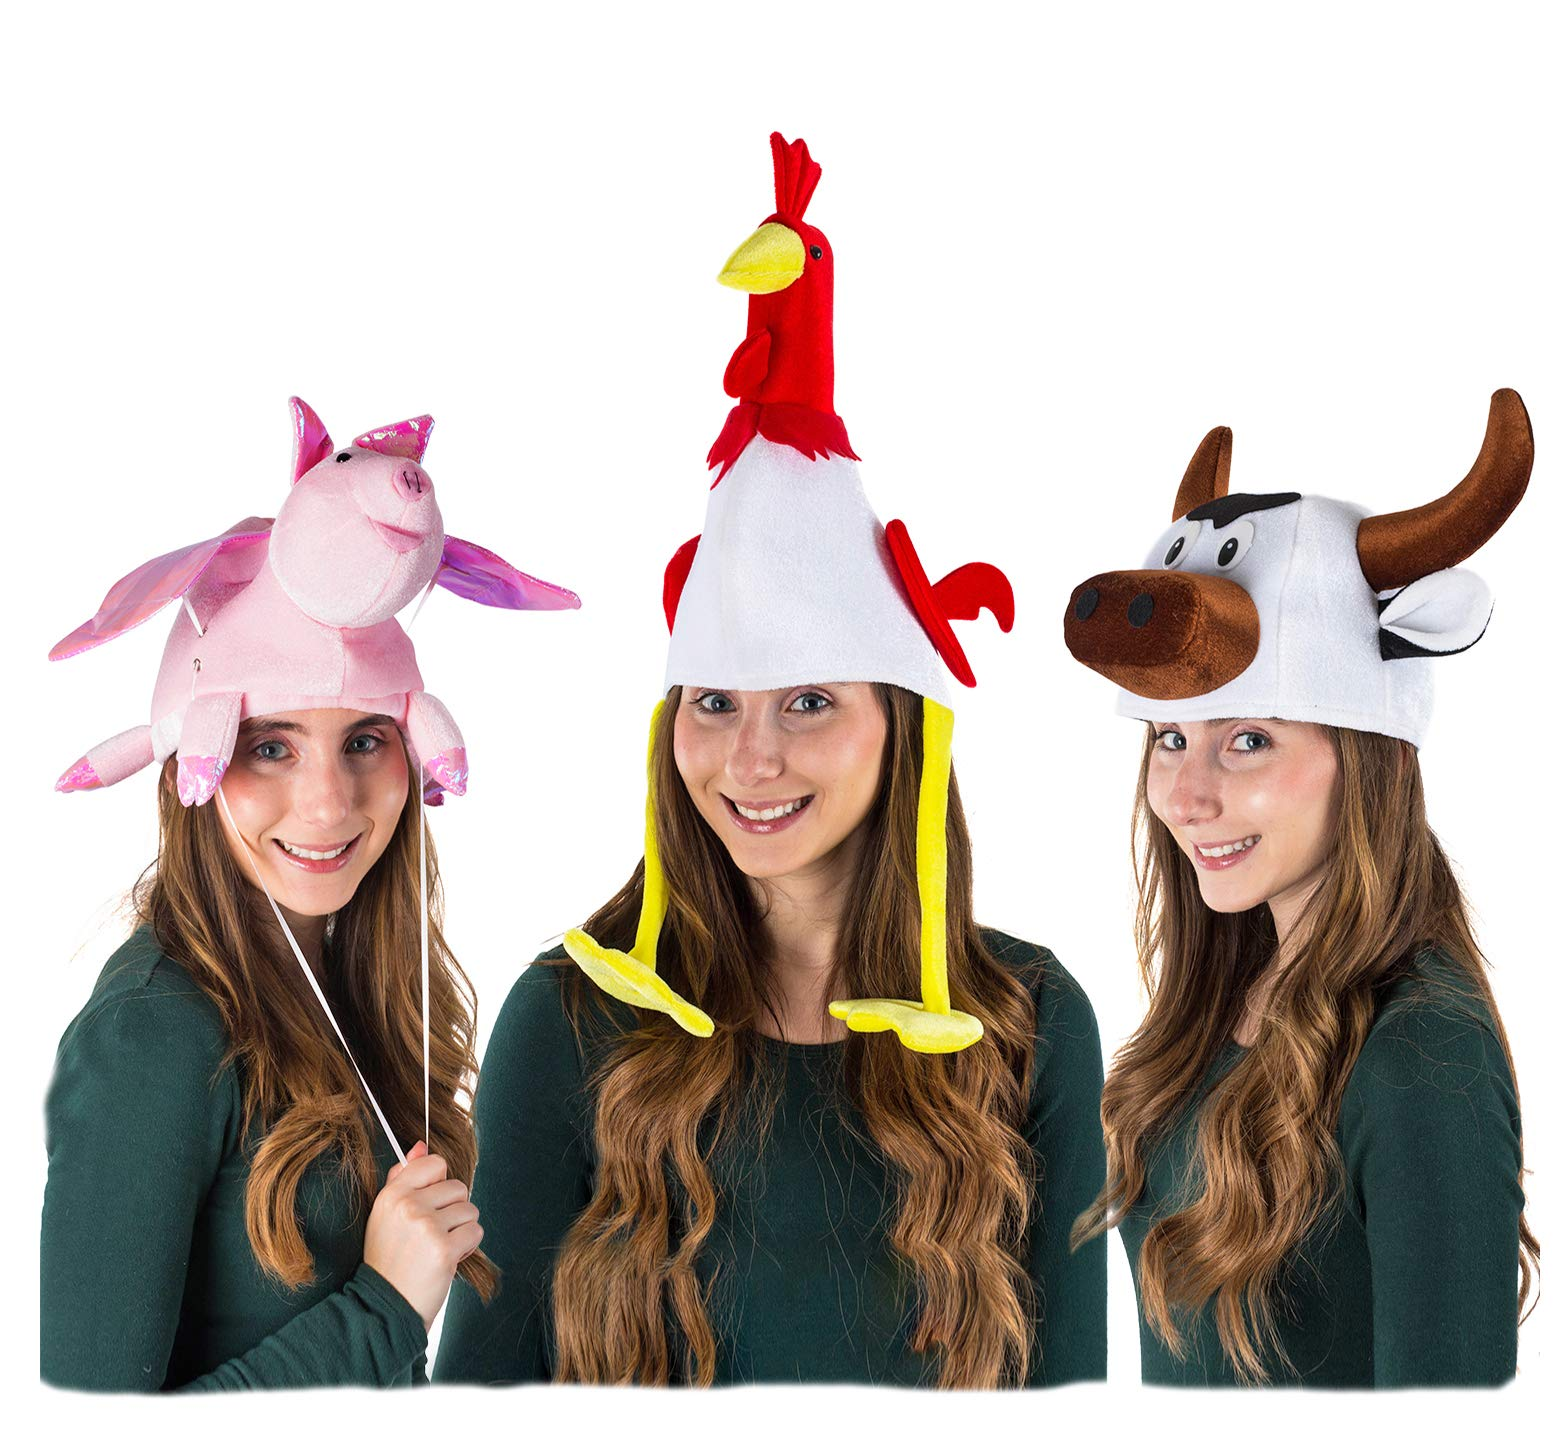 Tigerdoe Animal Costume Hats - 3 Pack - Farm Animal Hats - Farm Party - Dress Up - Farmer Theme Party by Tigerdoe